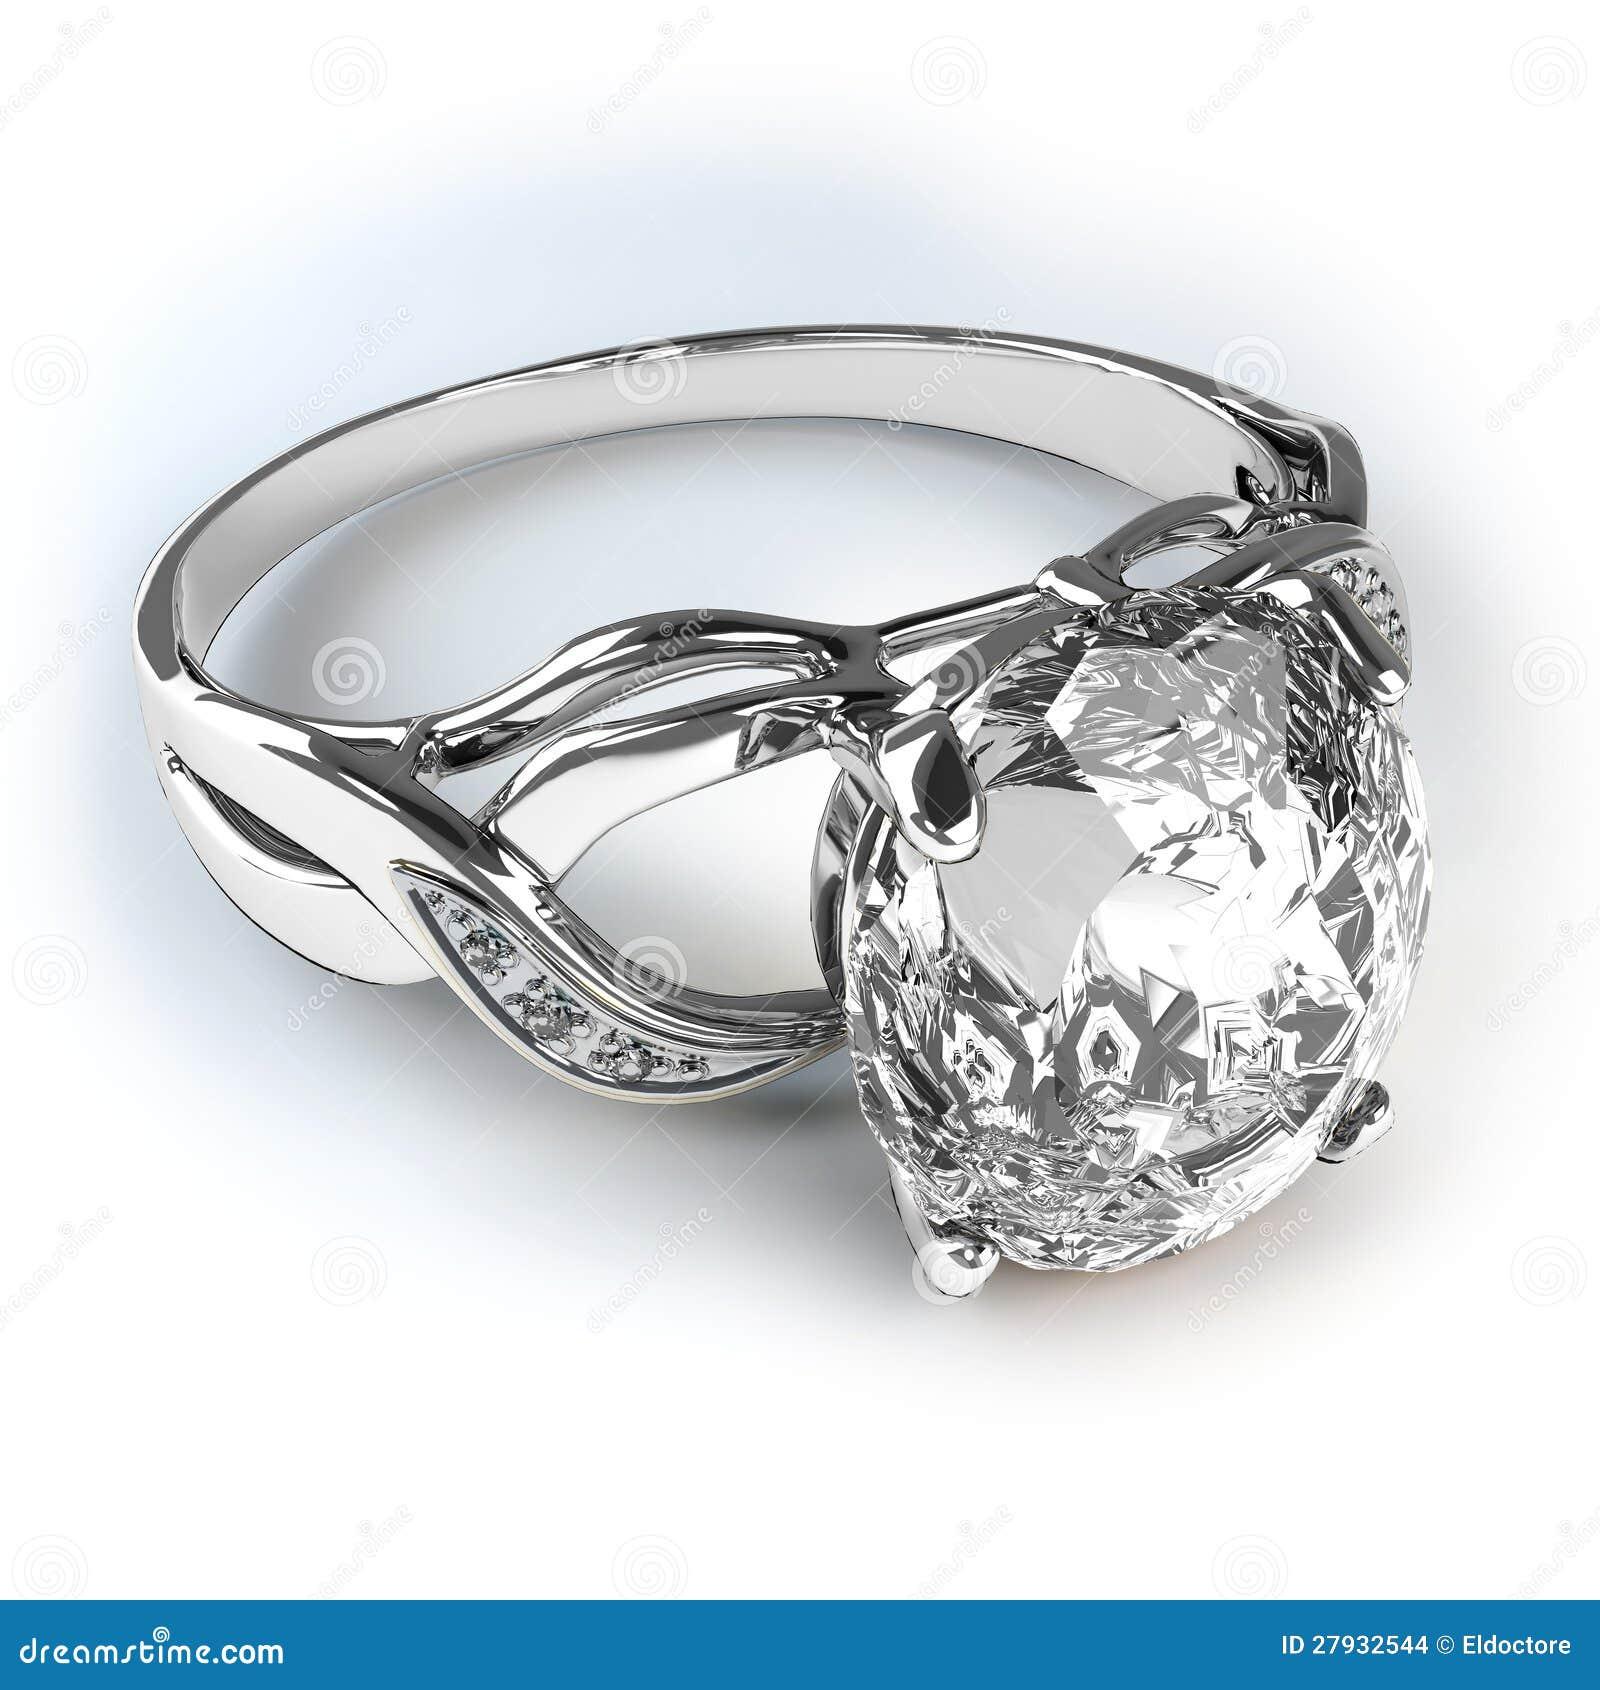 stock images wedding silver diamond ring image silver diamond wedding rings Wedding silver diamond ring